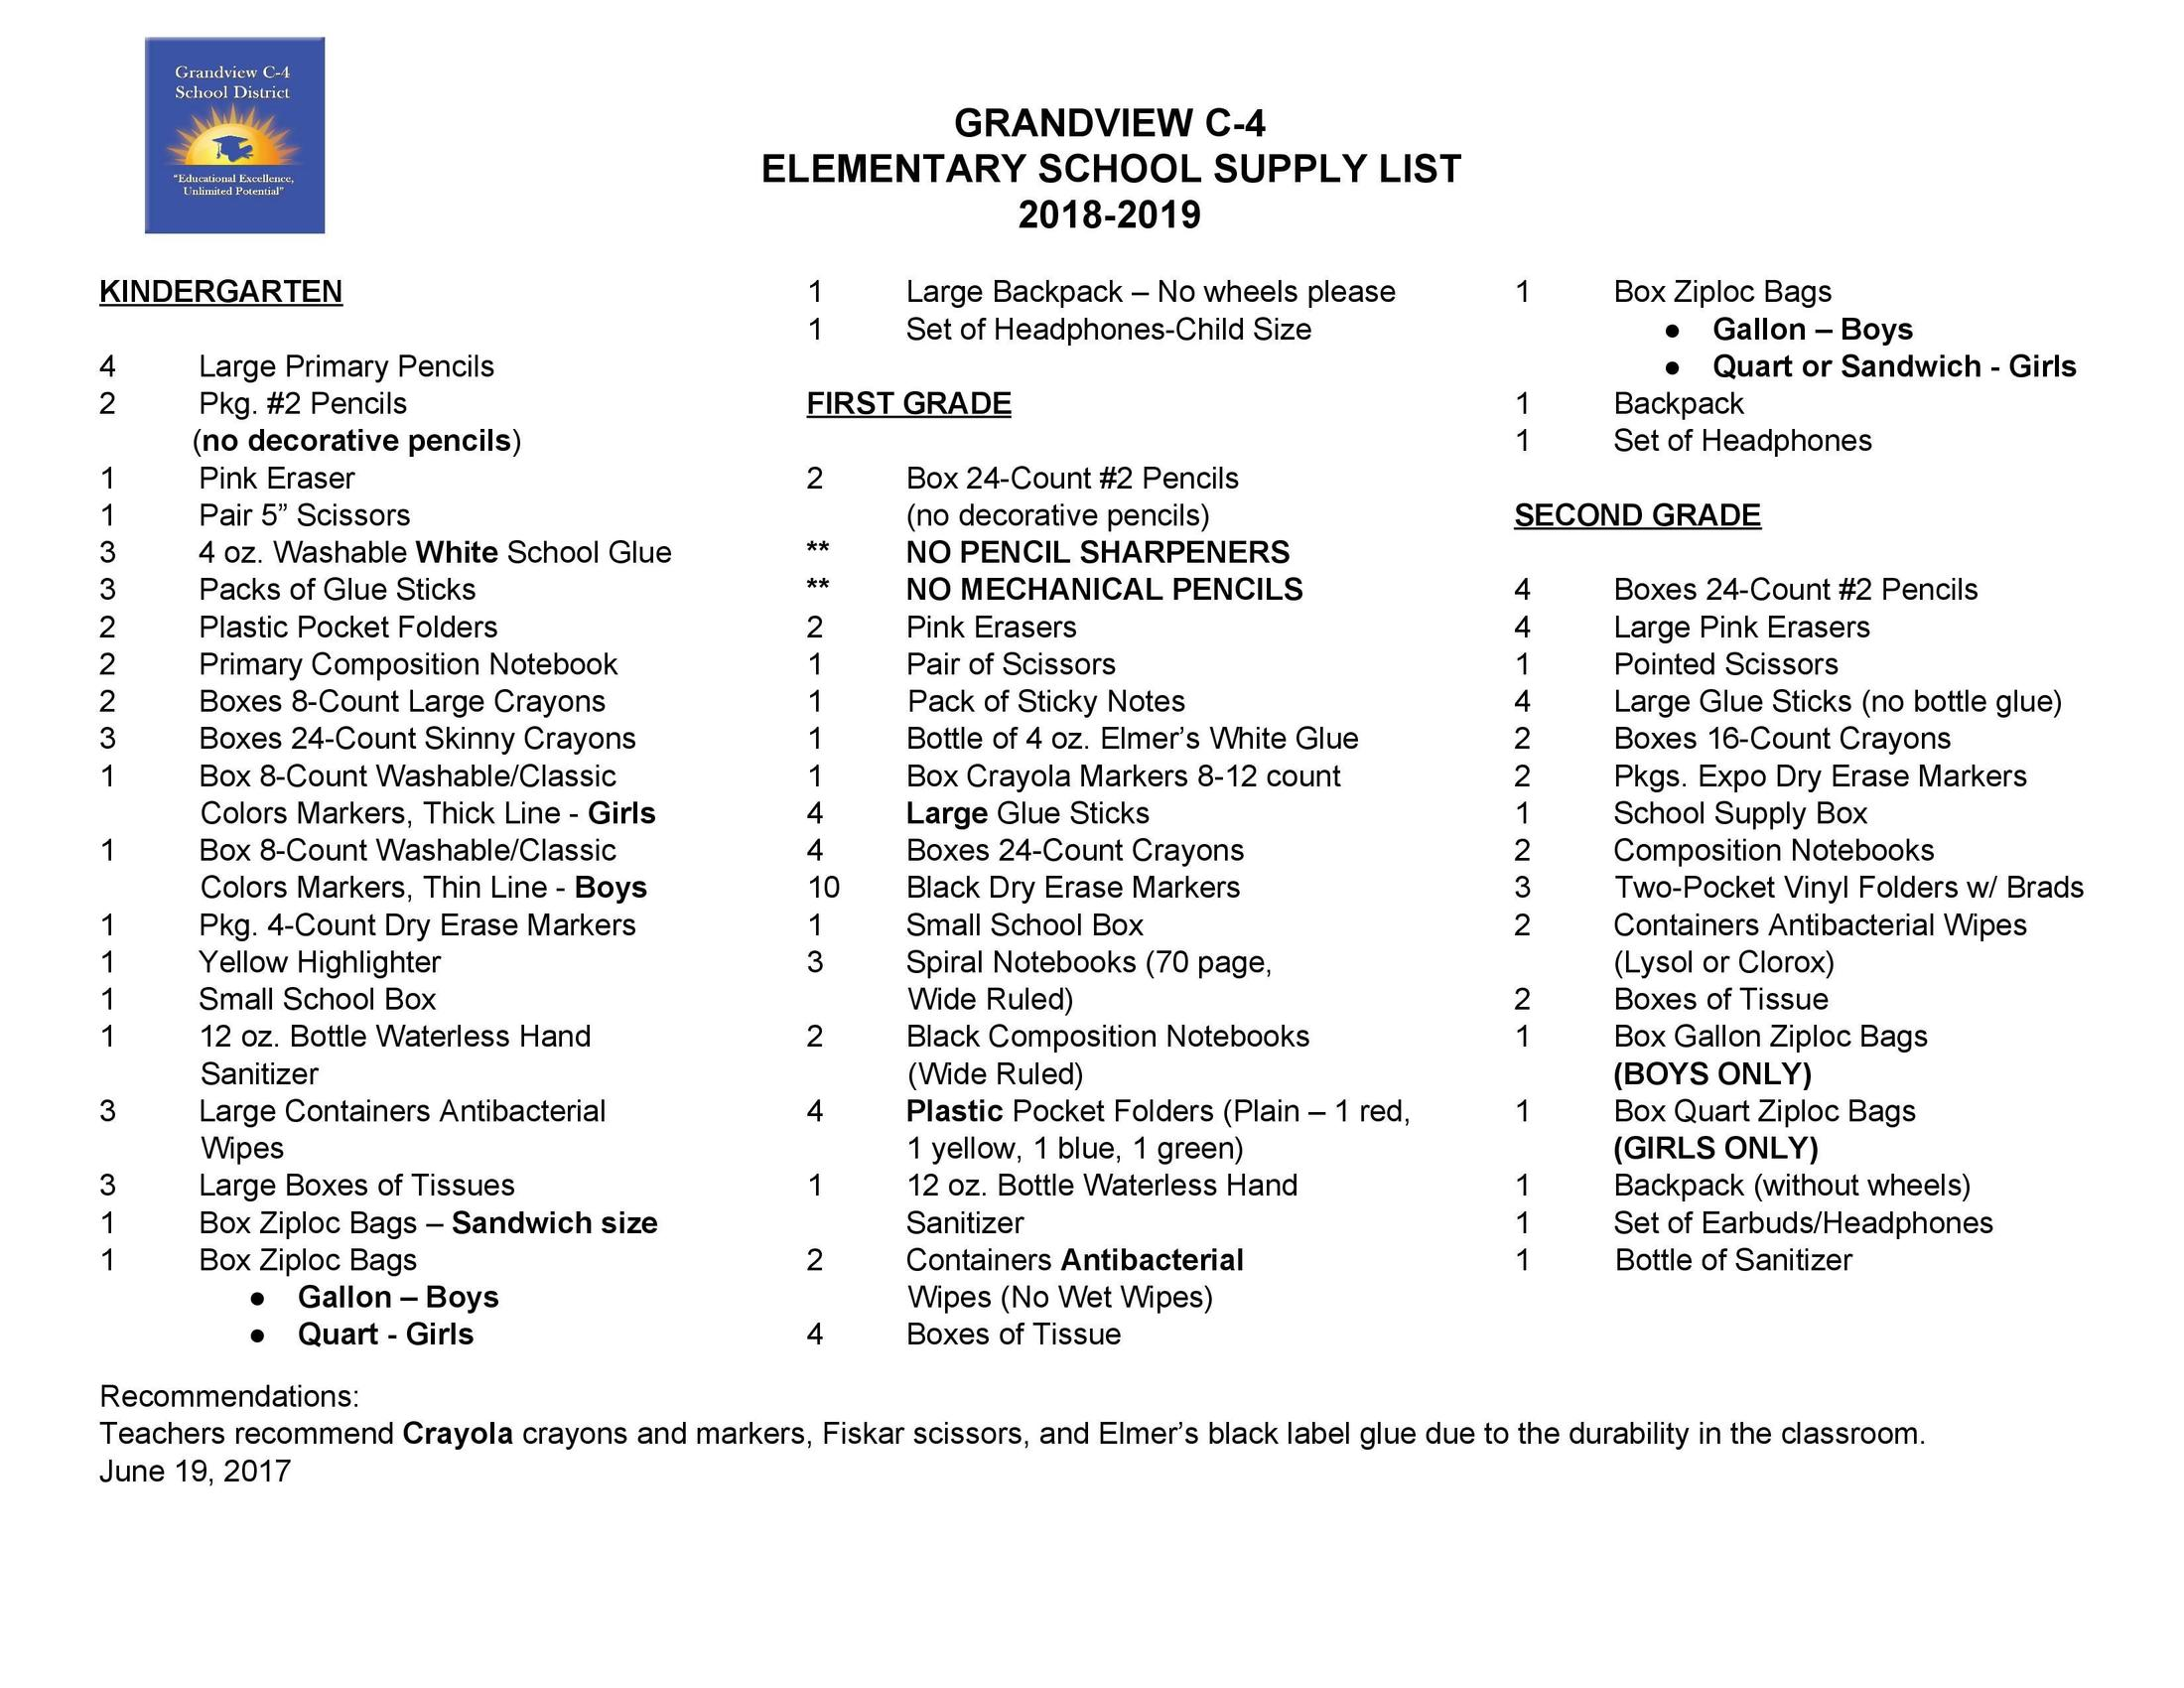 Supply List Families Grandview C 4 School District